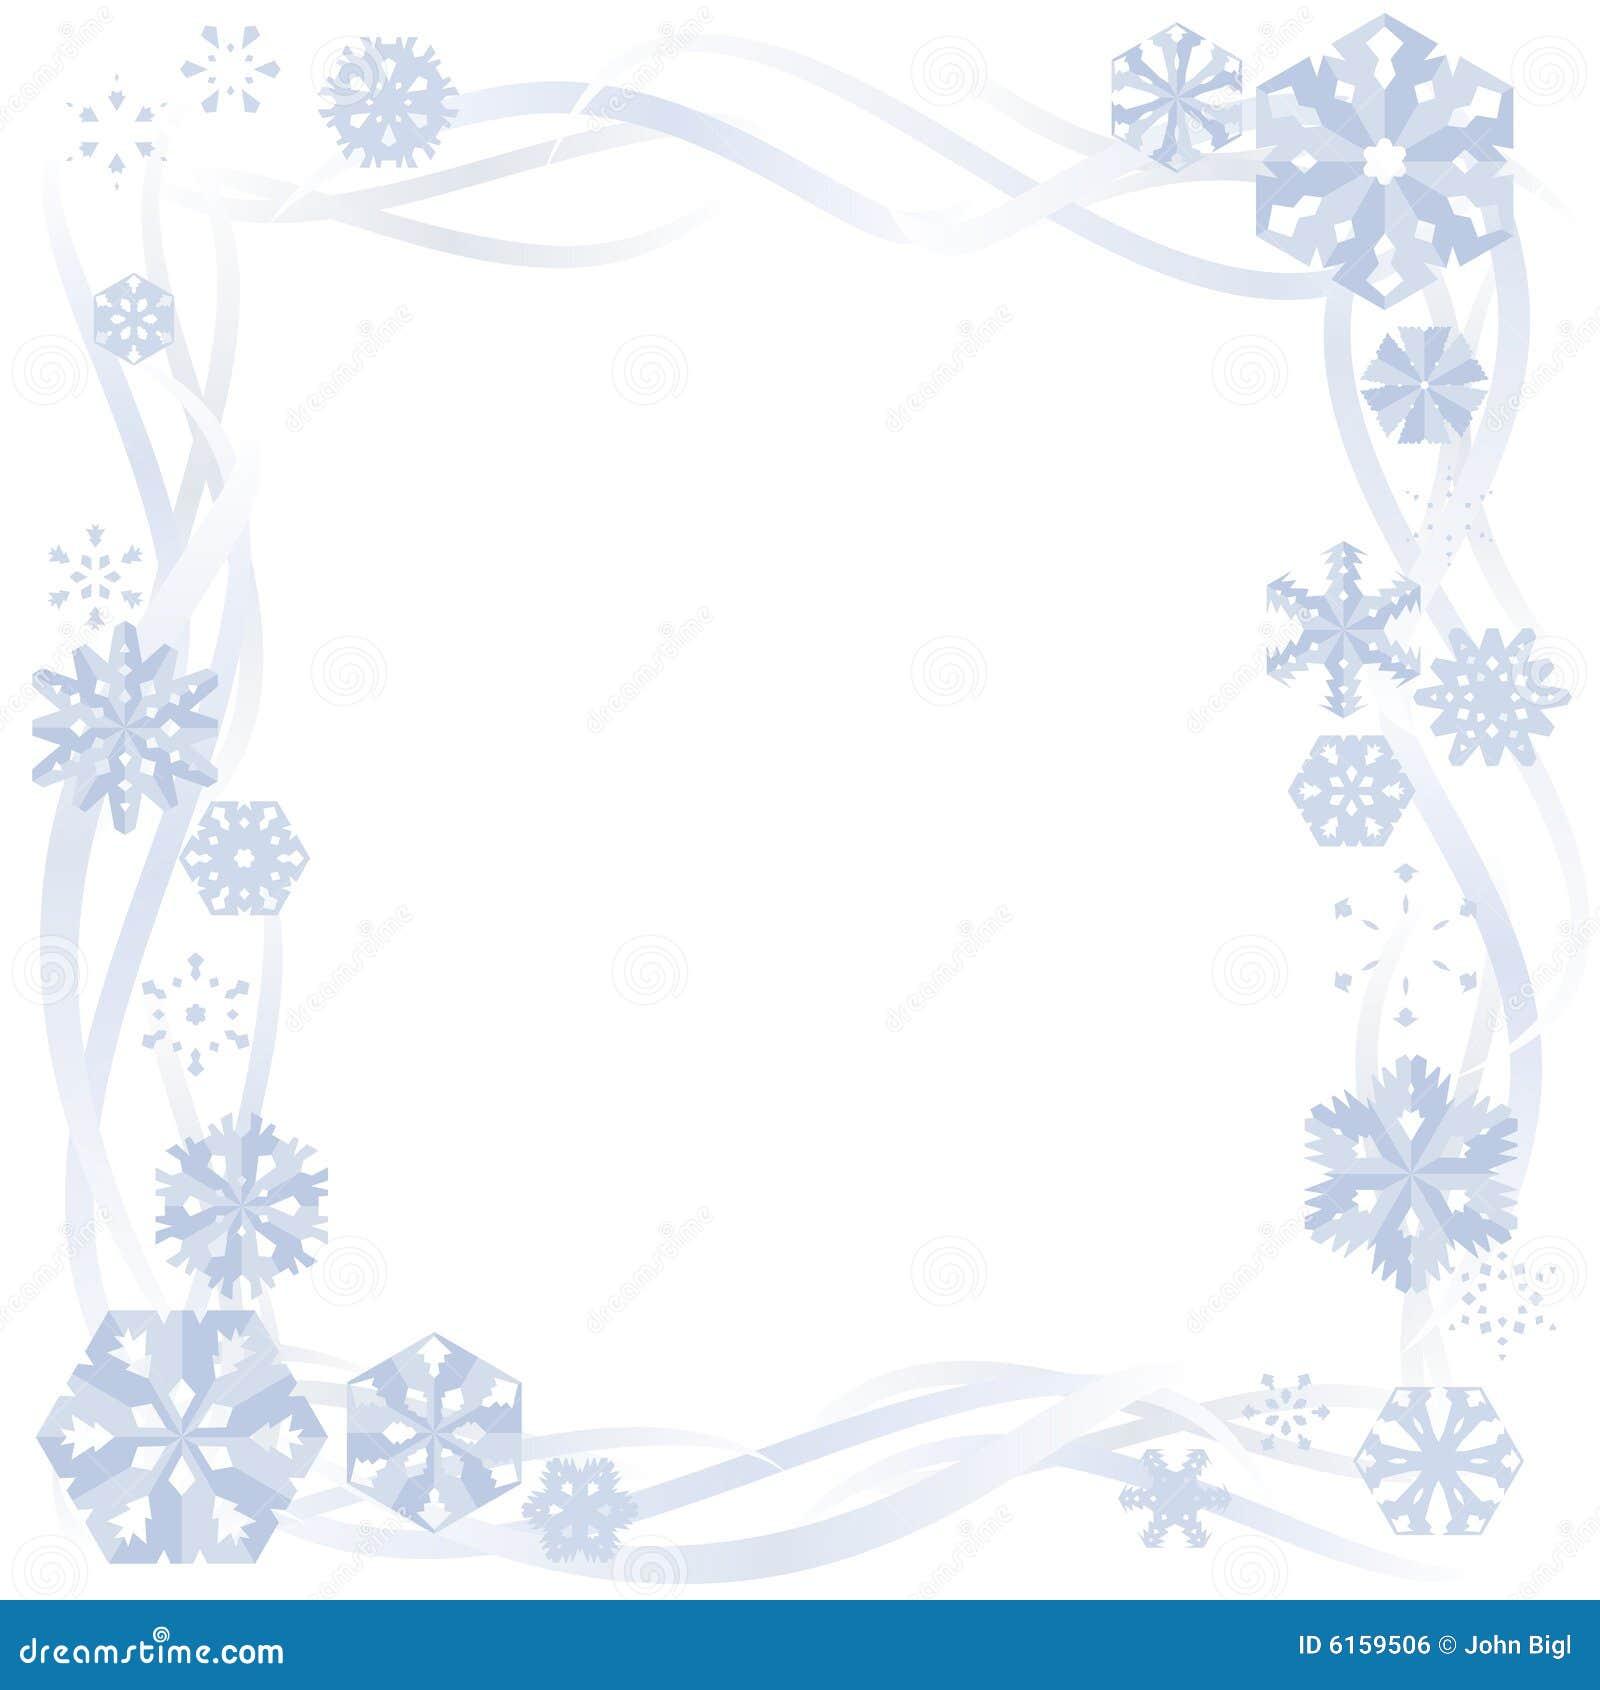 free snow clip art borders - photo #48